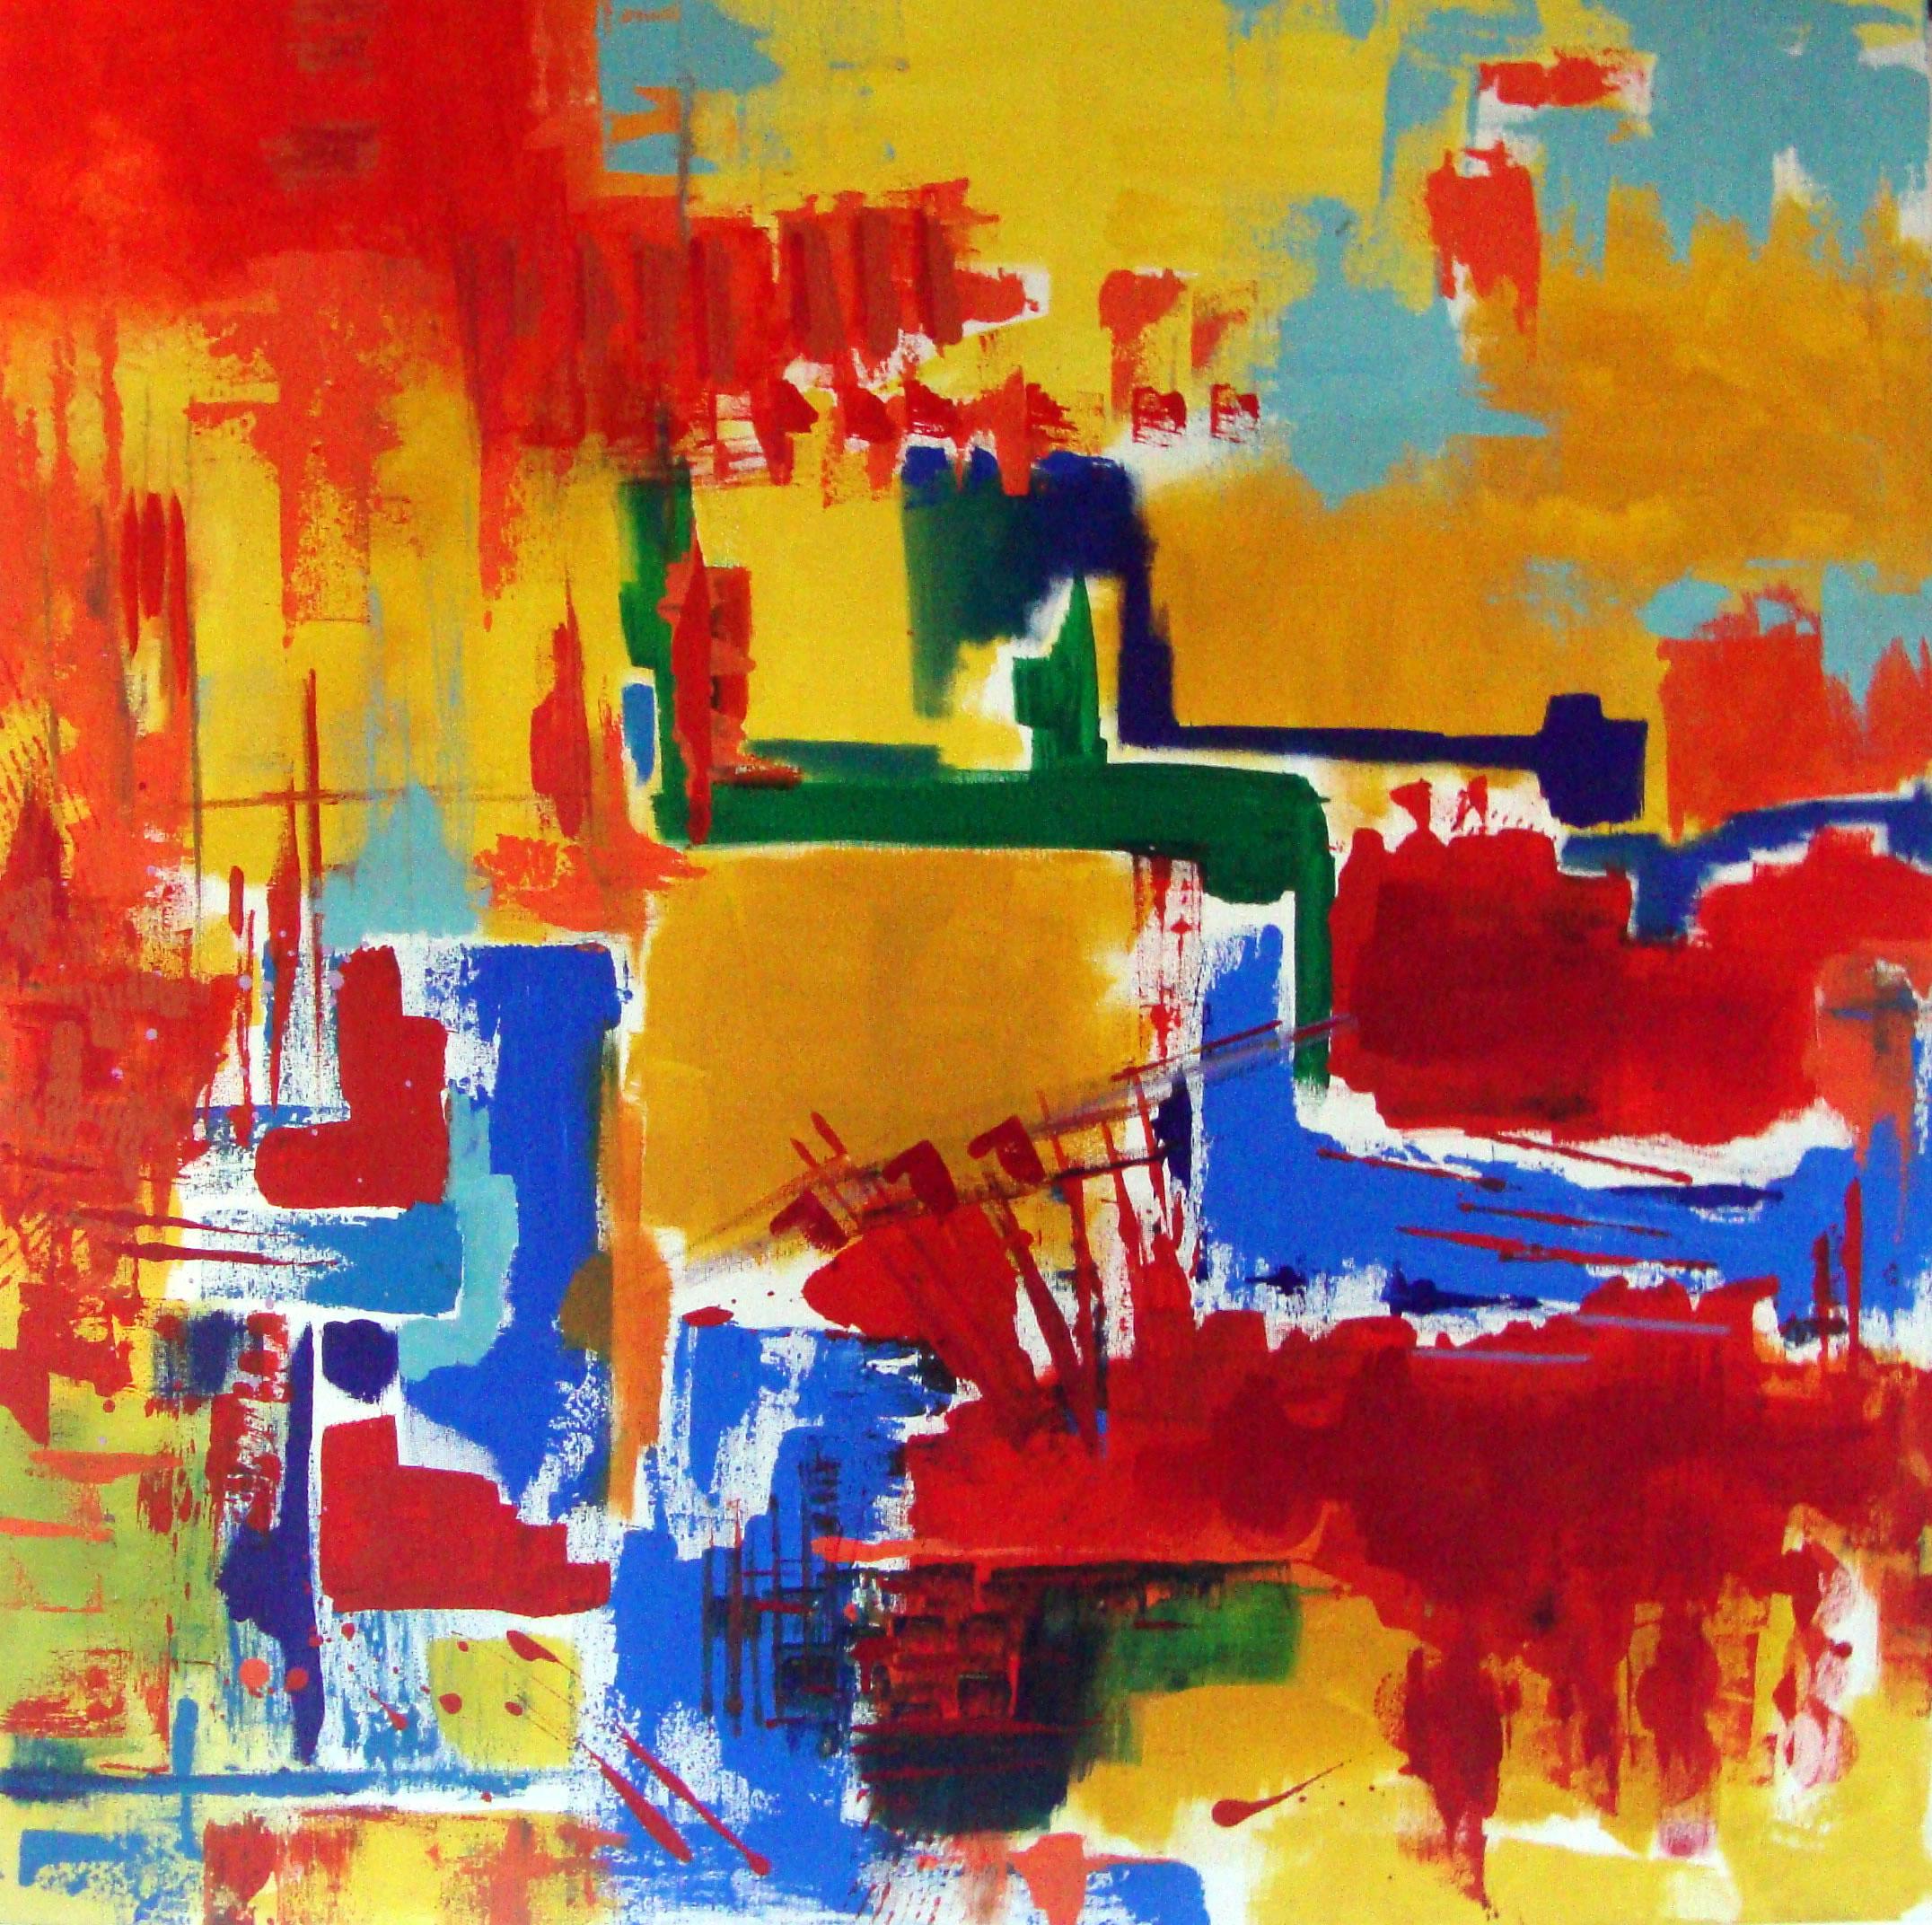 Sinfonia Abstrata 2017 Tamanho: 100 x 100 Acrílico sobre tela